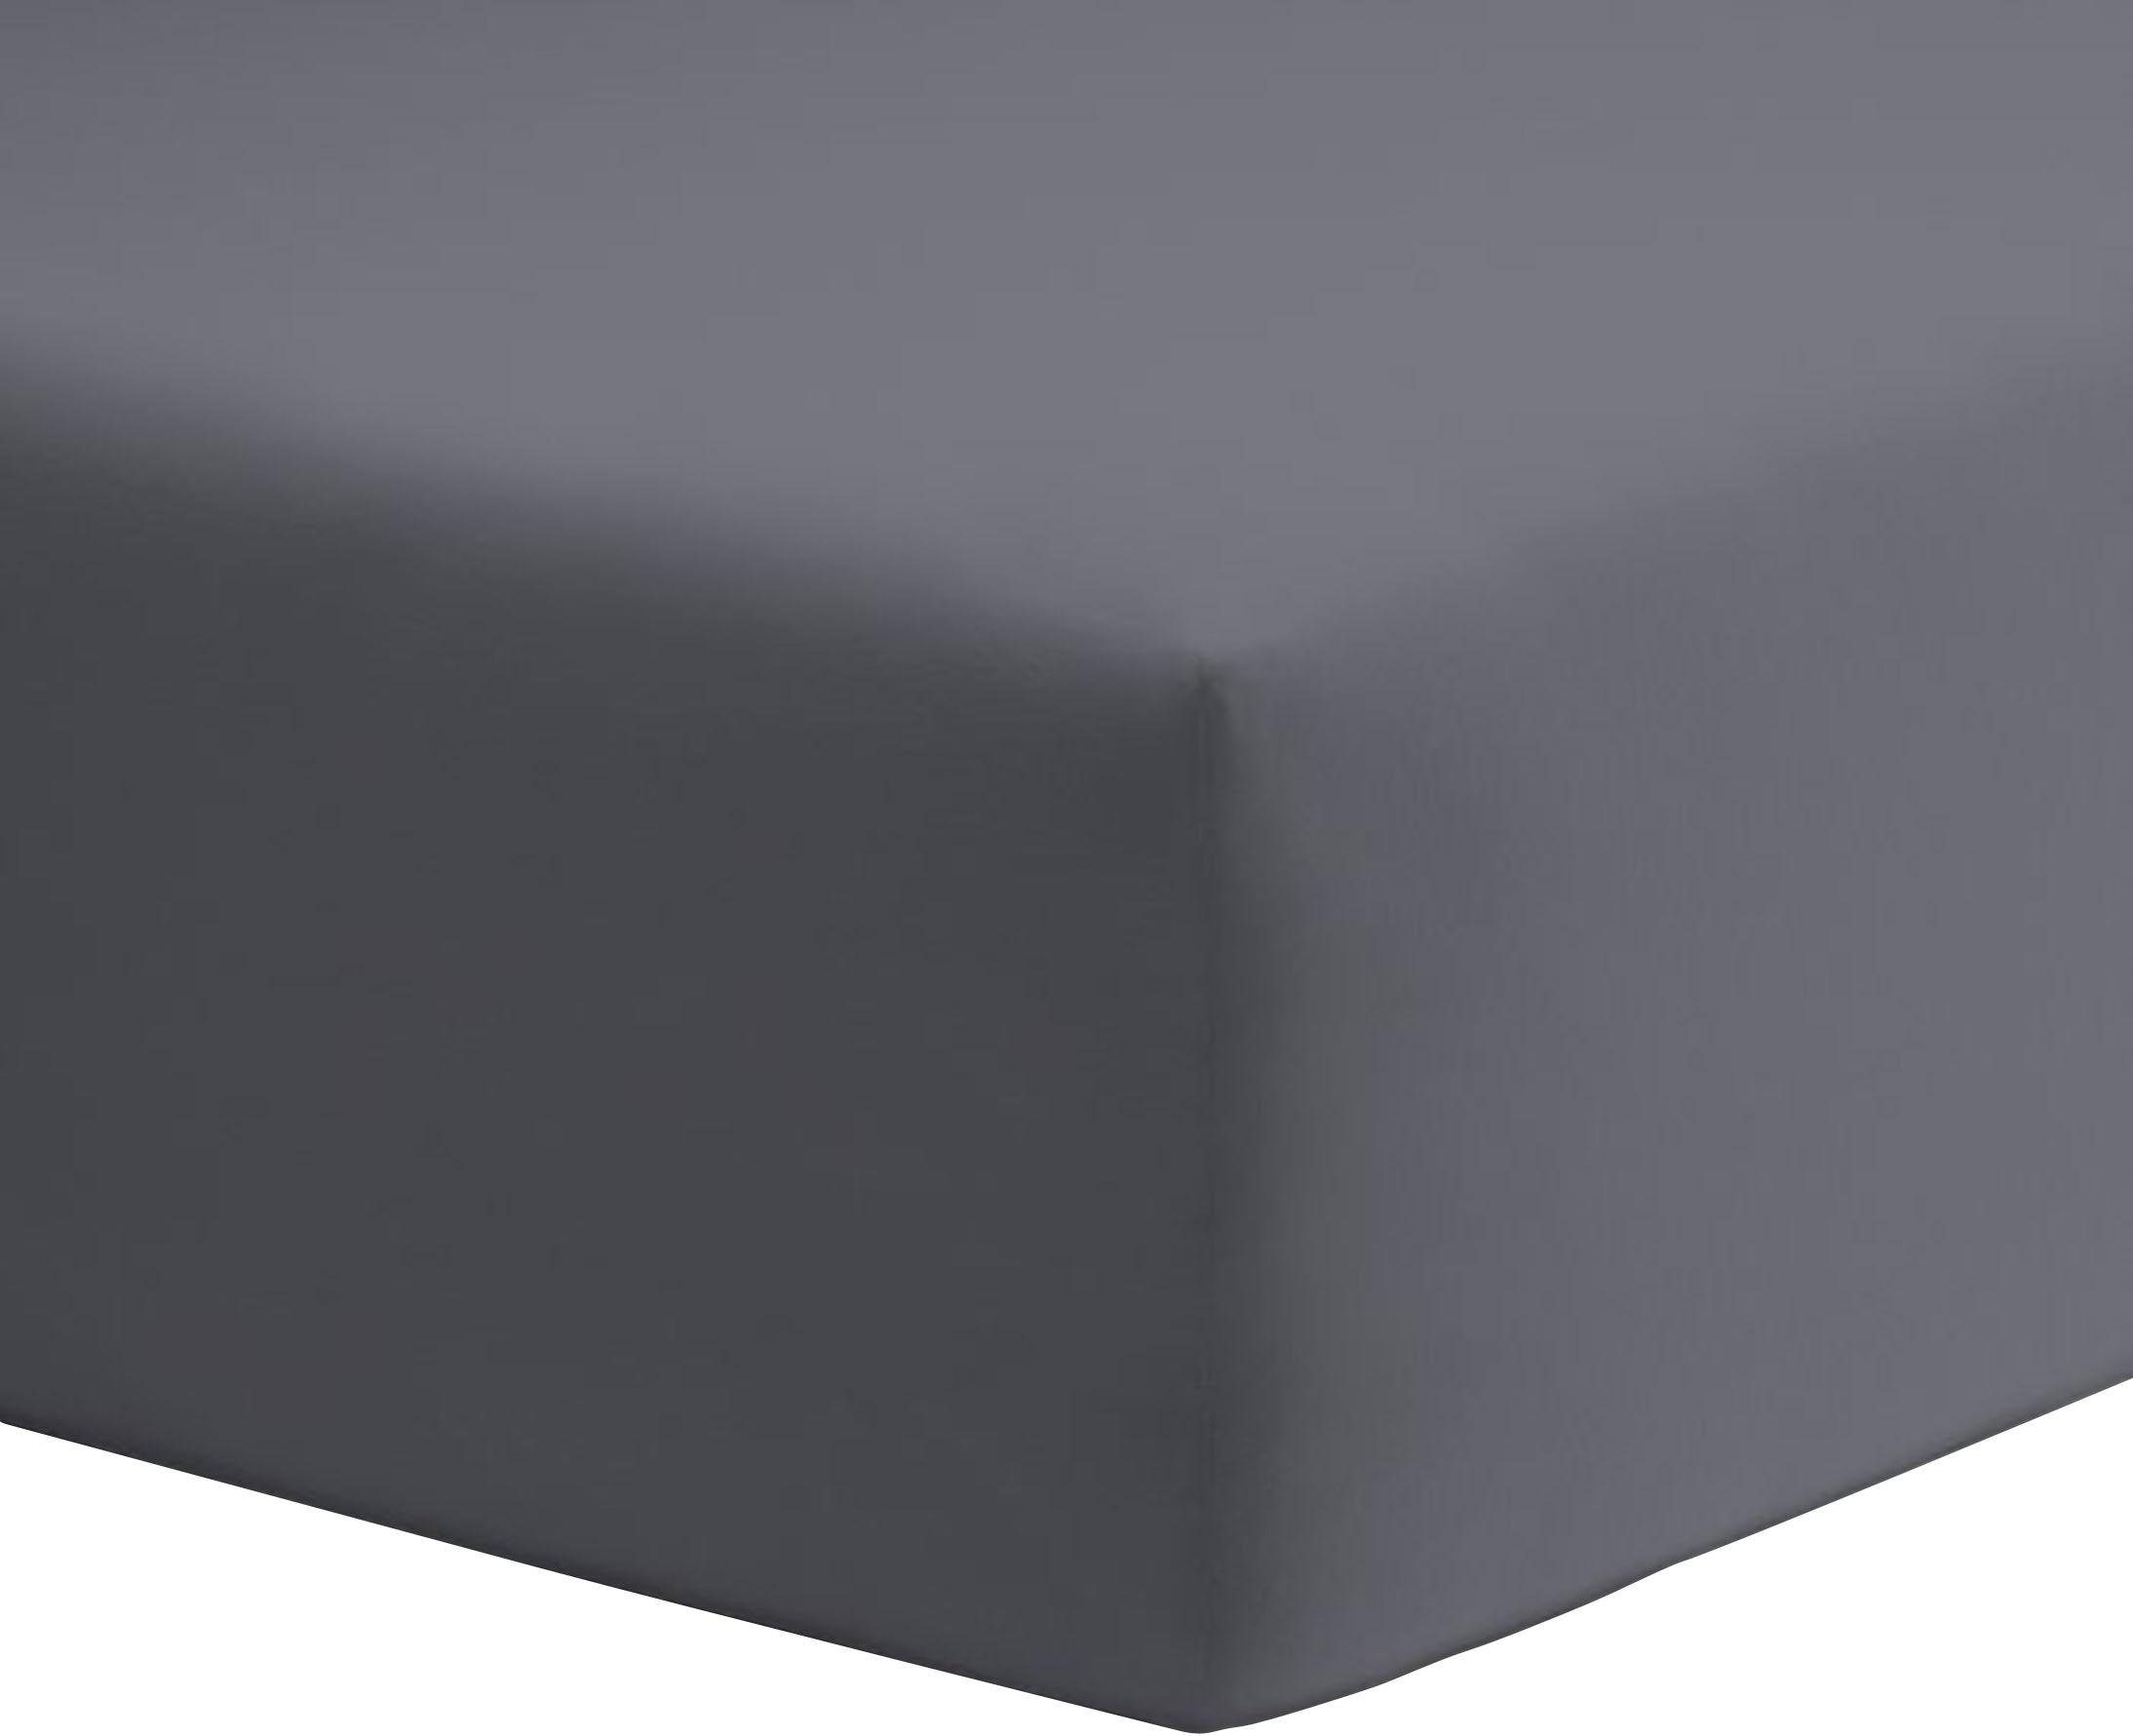 6491a1793d08bd Heimtextilien online kaufen   Möbel-Suchmaschine   ladendirekt.de ...